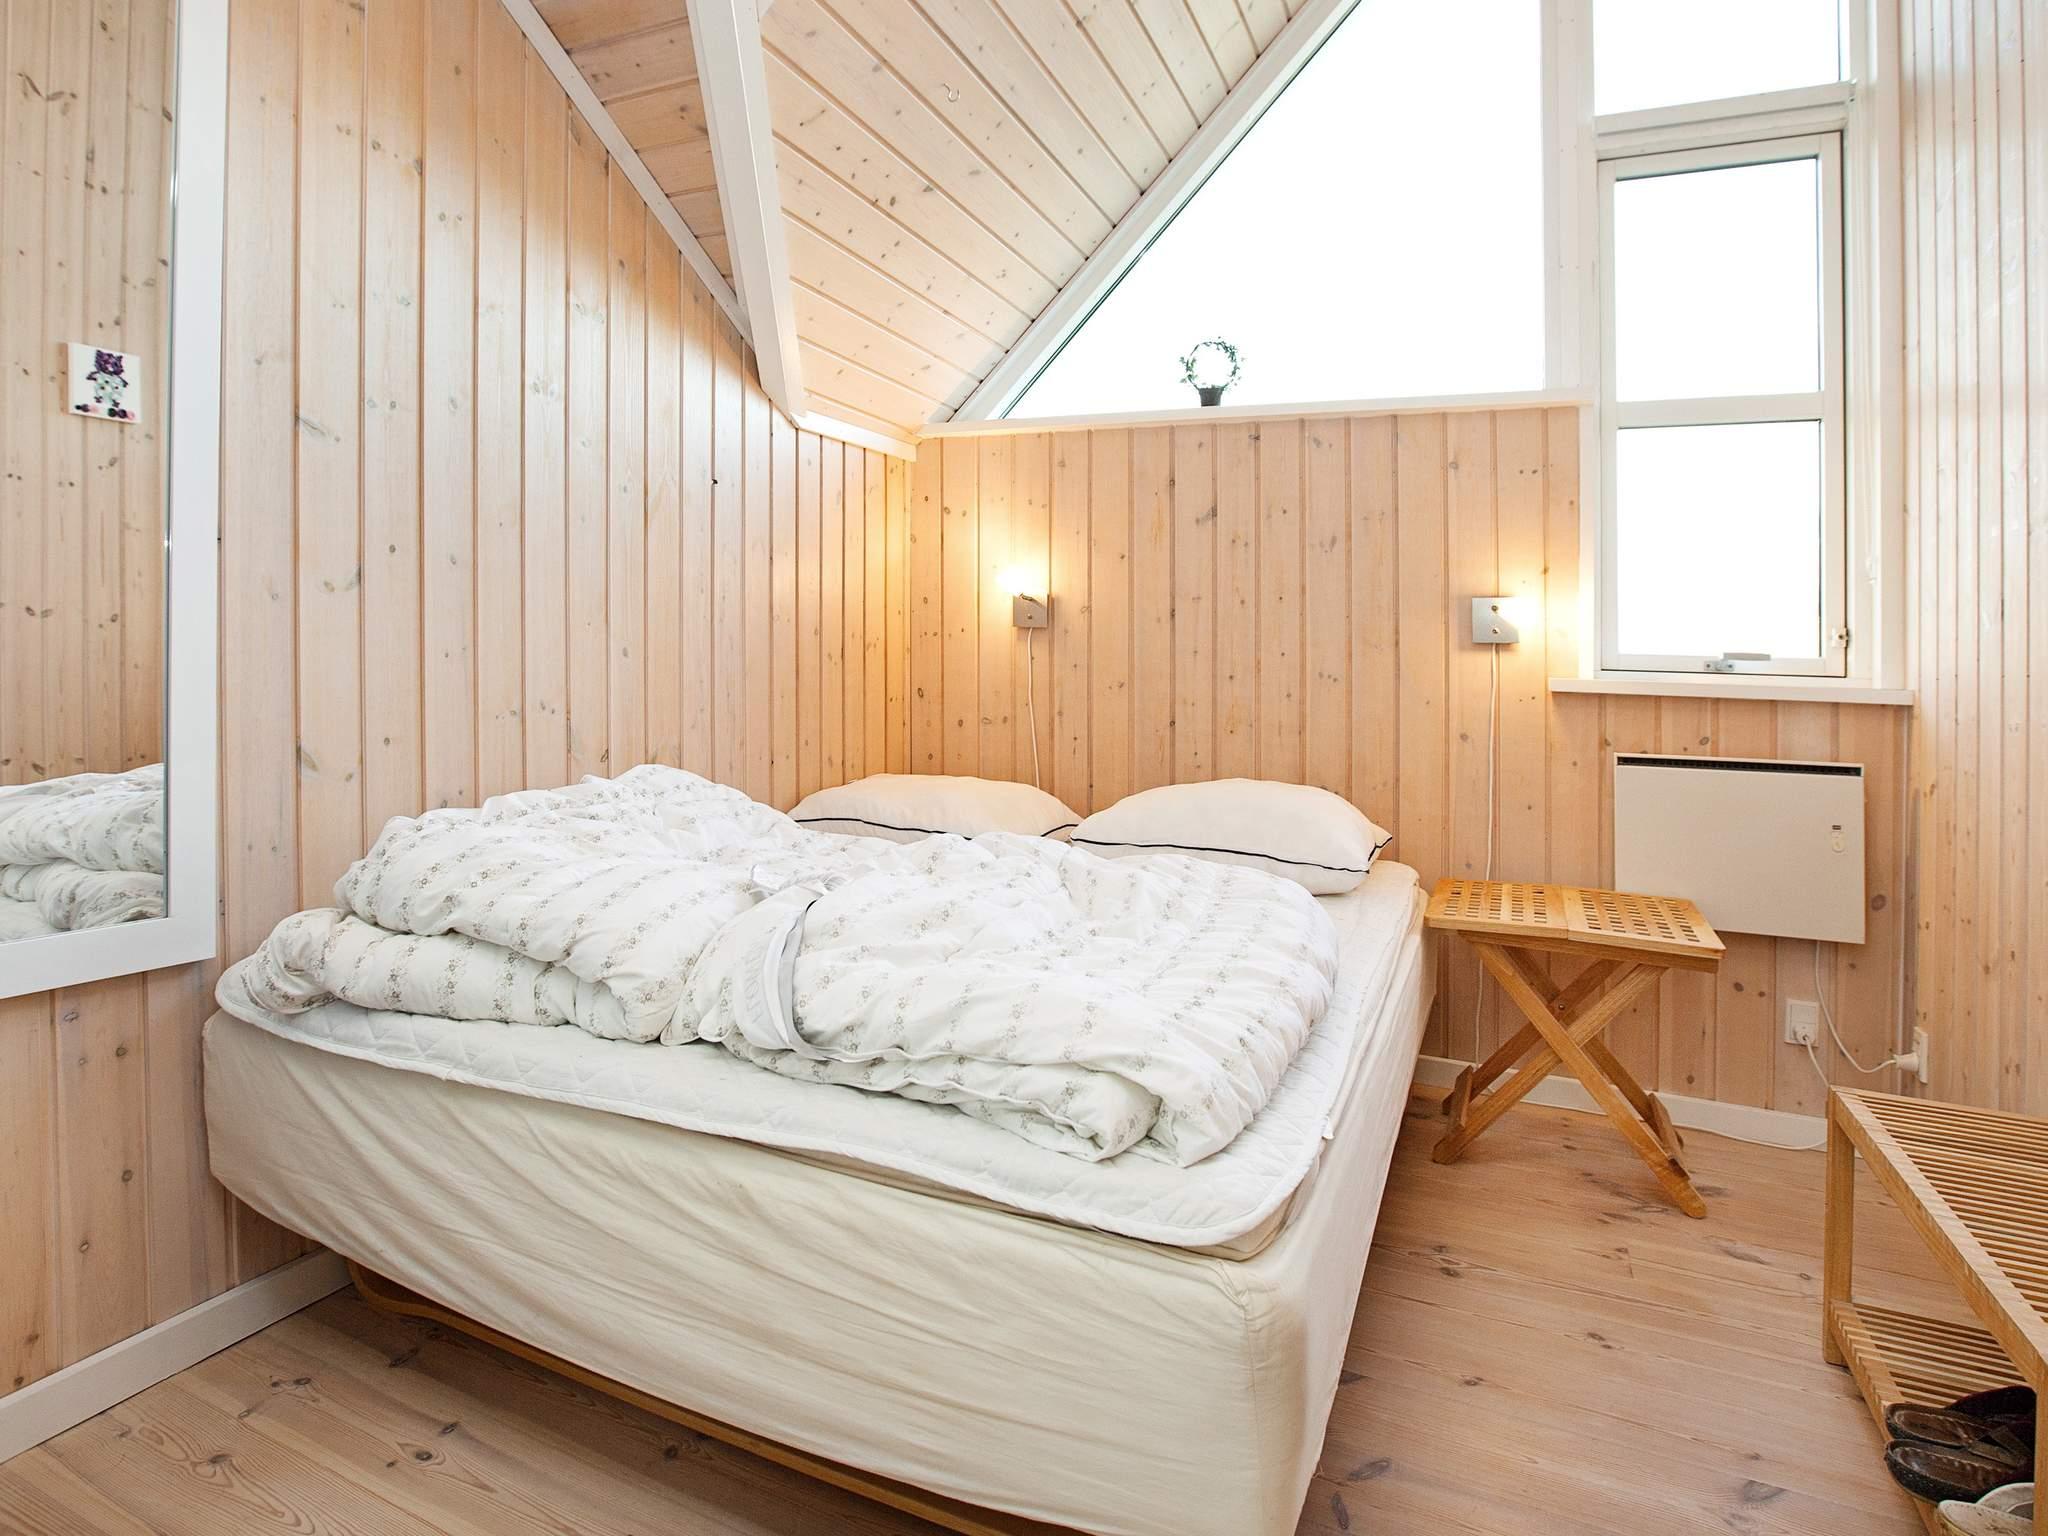 Ferienhaus Røsnæs (488905), Kalundborg, , Westseeland, Dänemark, Bild 12